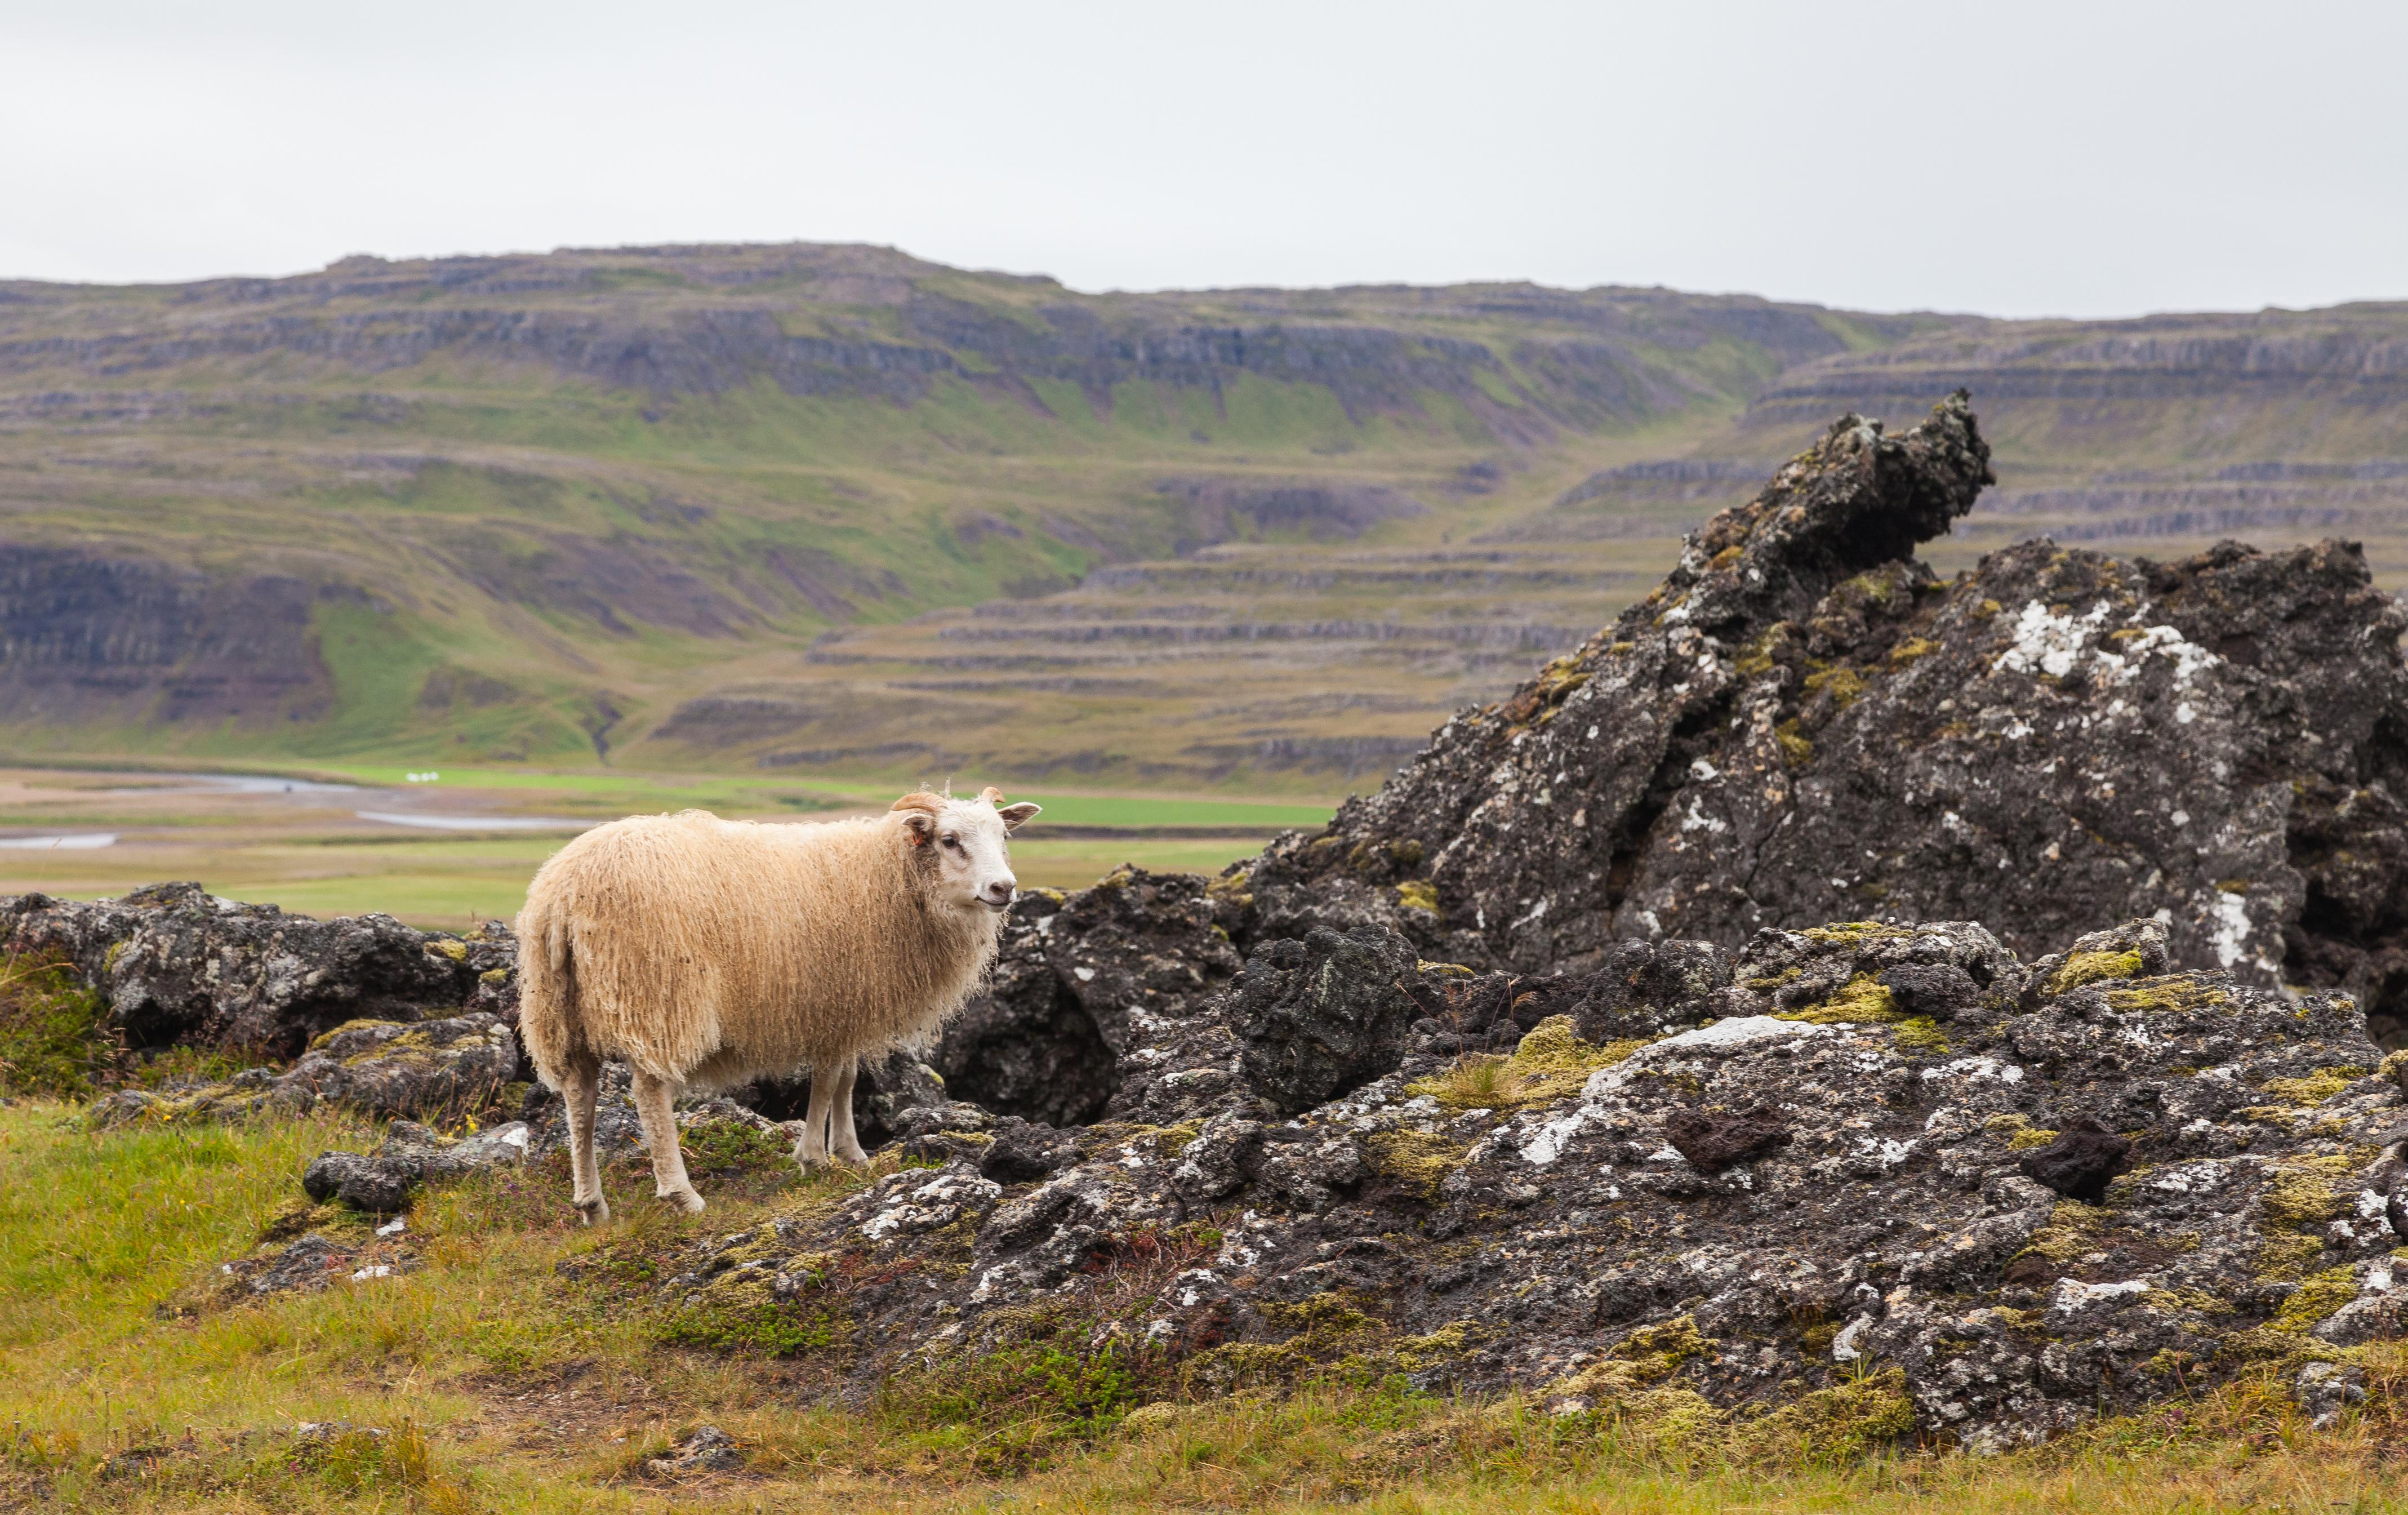 Oveja_islandesa,_Grábrók,_Vesturland,_Islandia,_2014-08-15,_DD_097